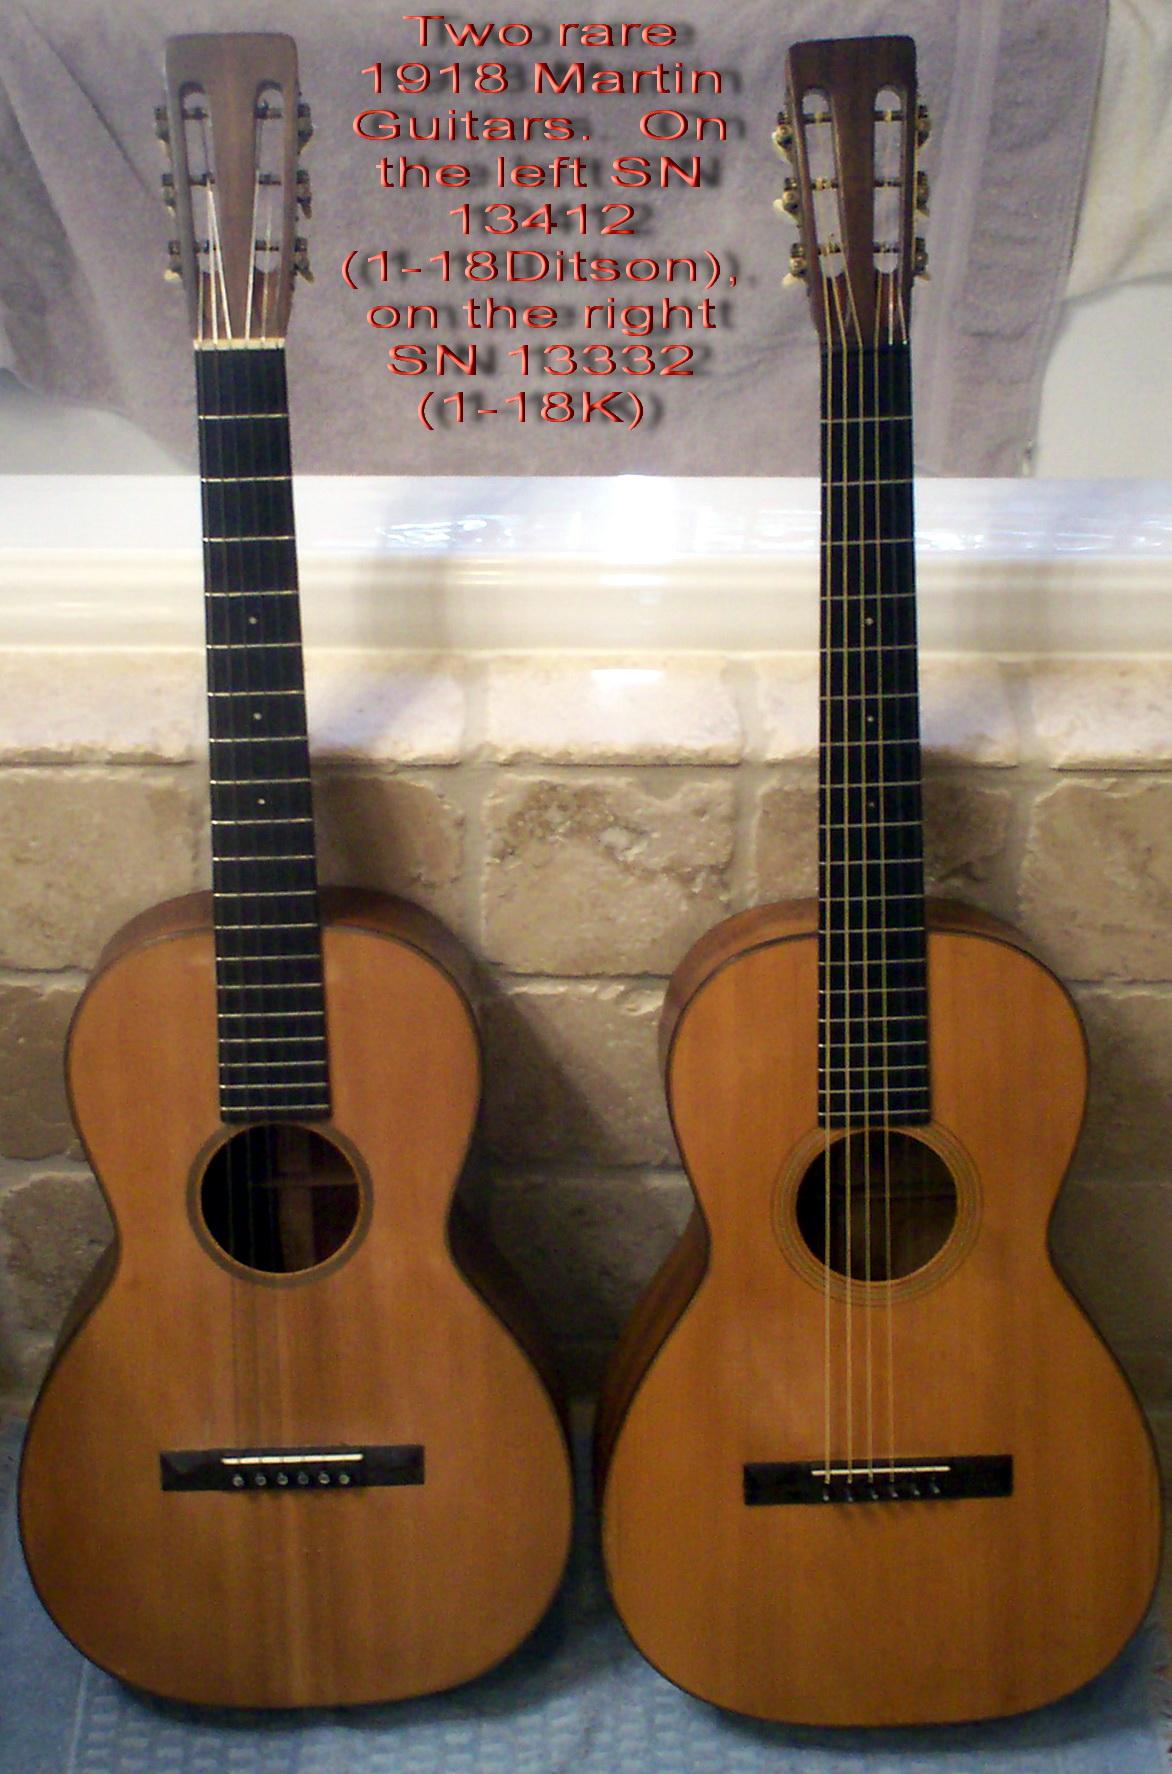 Two Unusual 1918 Martin Guitars: emkey — LiveJournal